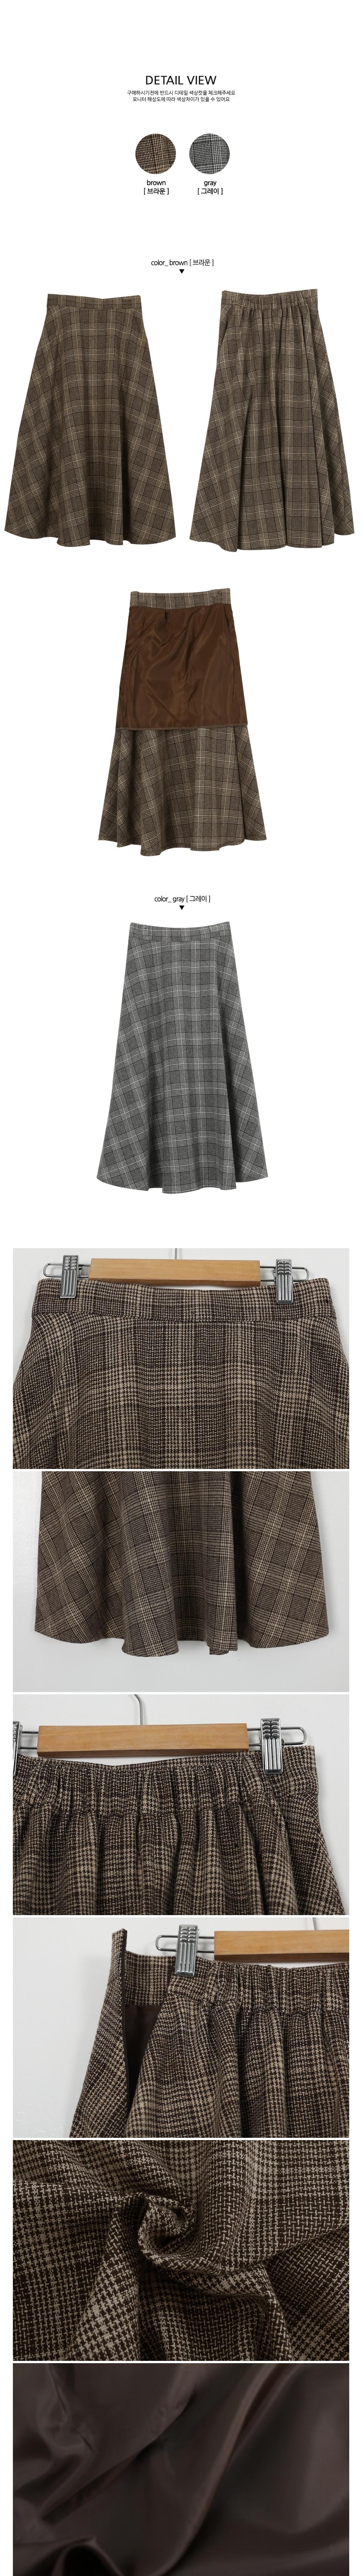 The check check wool wool skirt